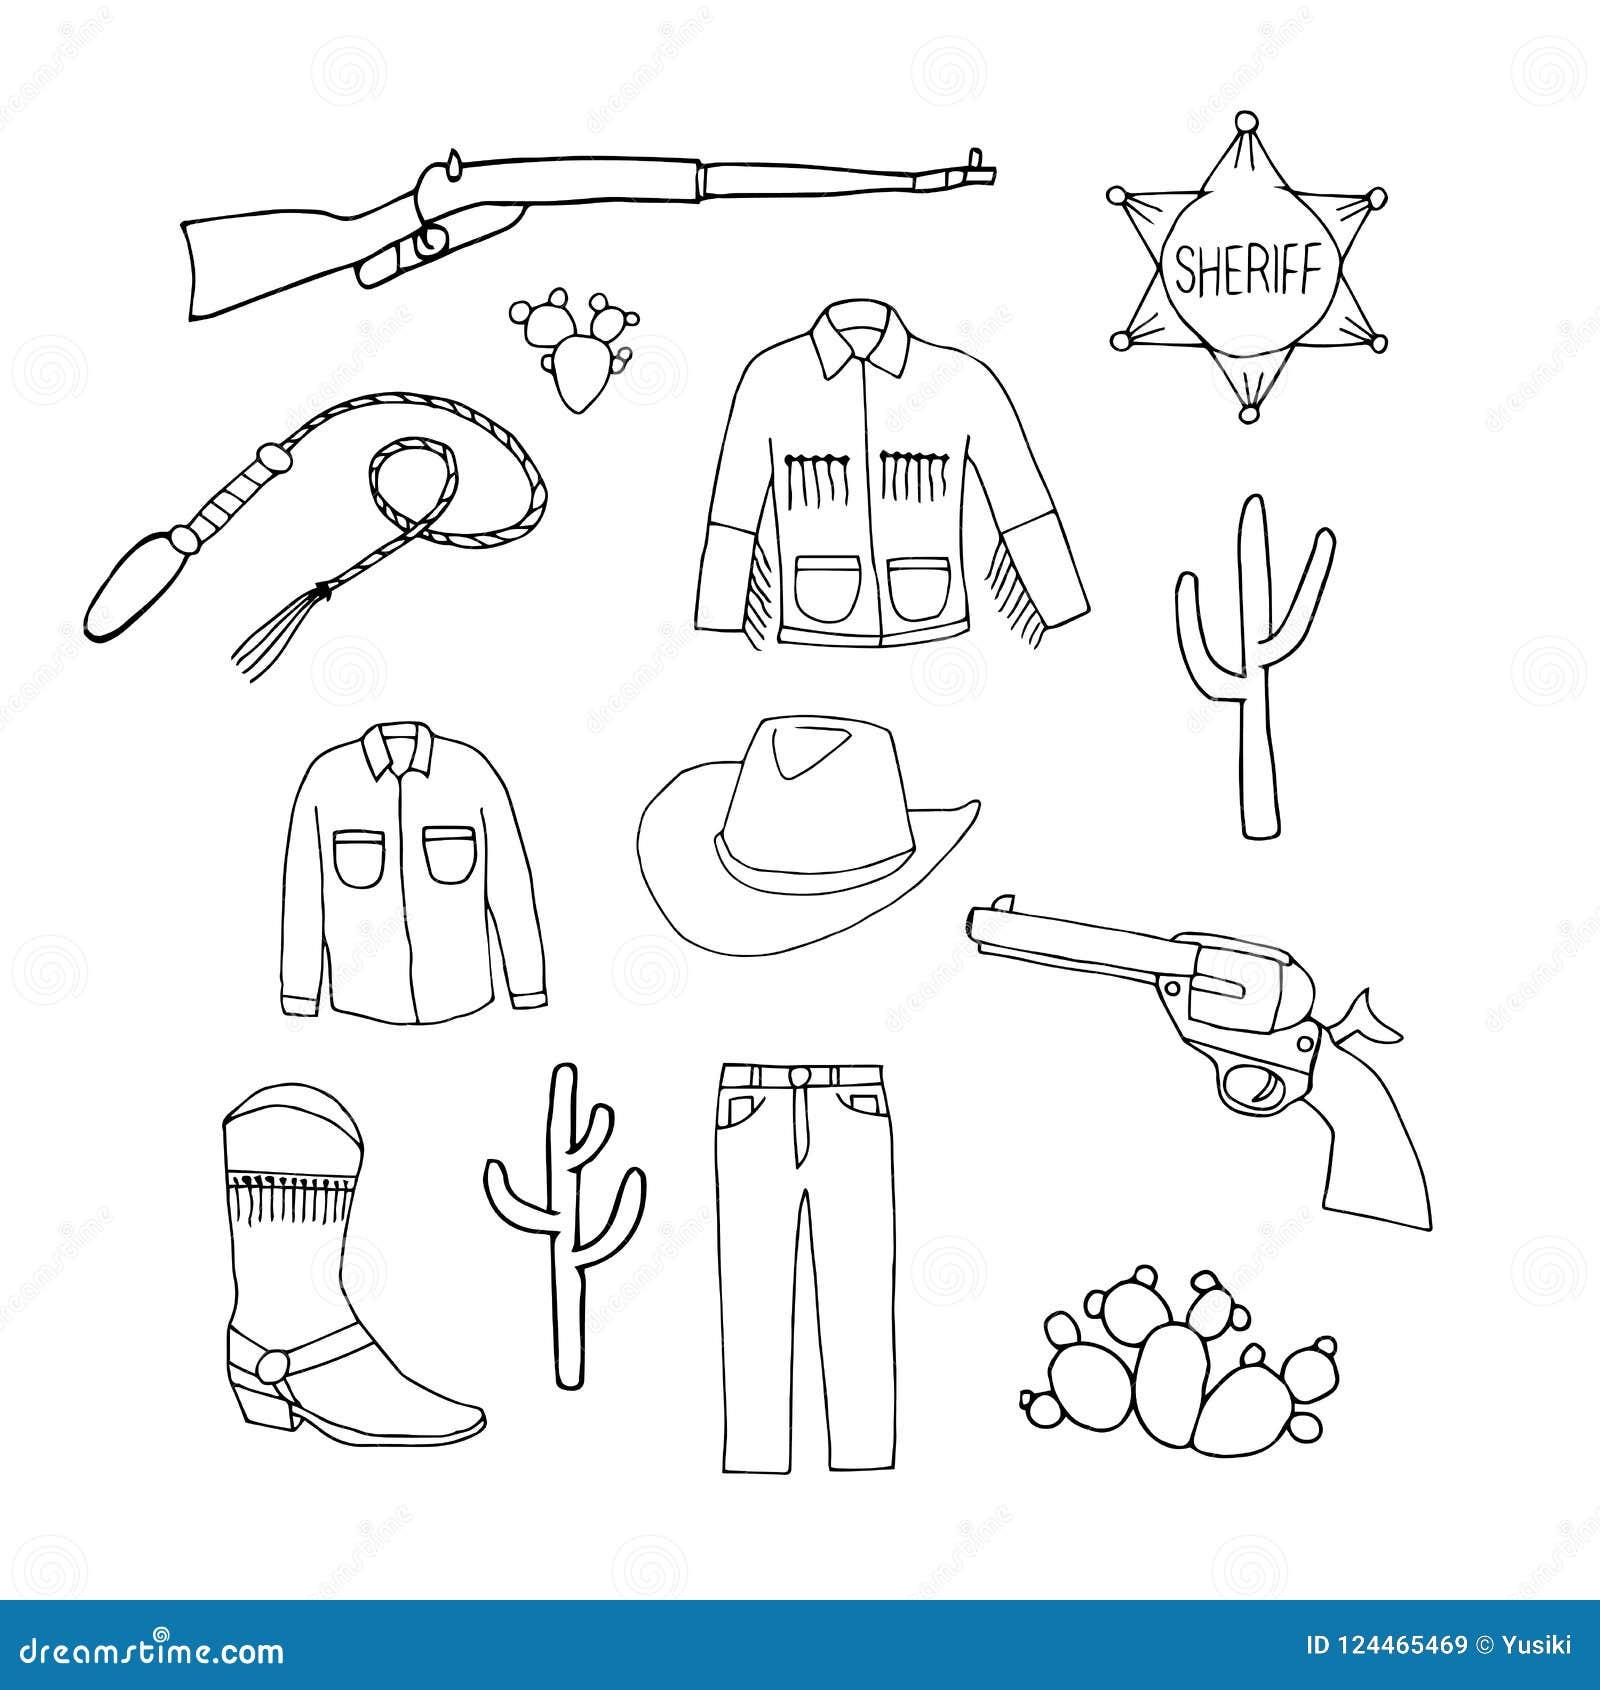 Set of cowboy symbols. Cowboy jeans, shirt, jacket, hat, boots